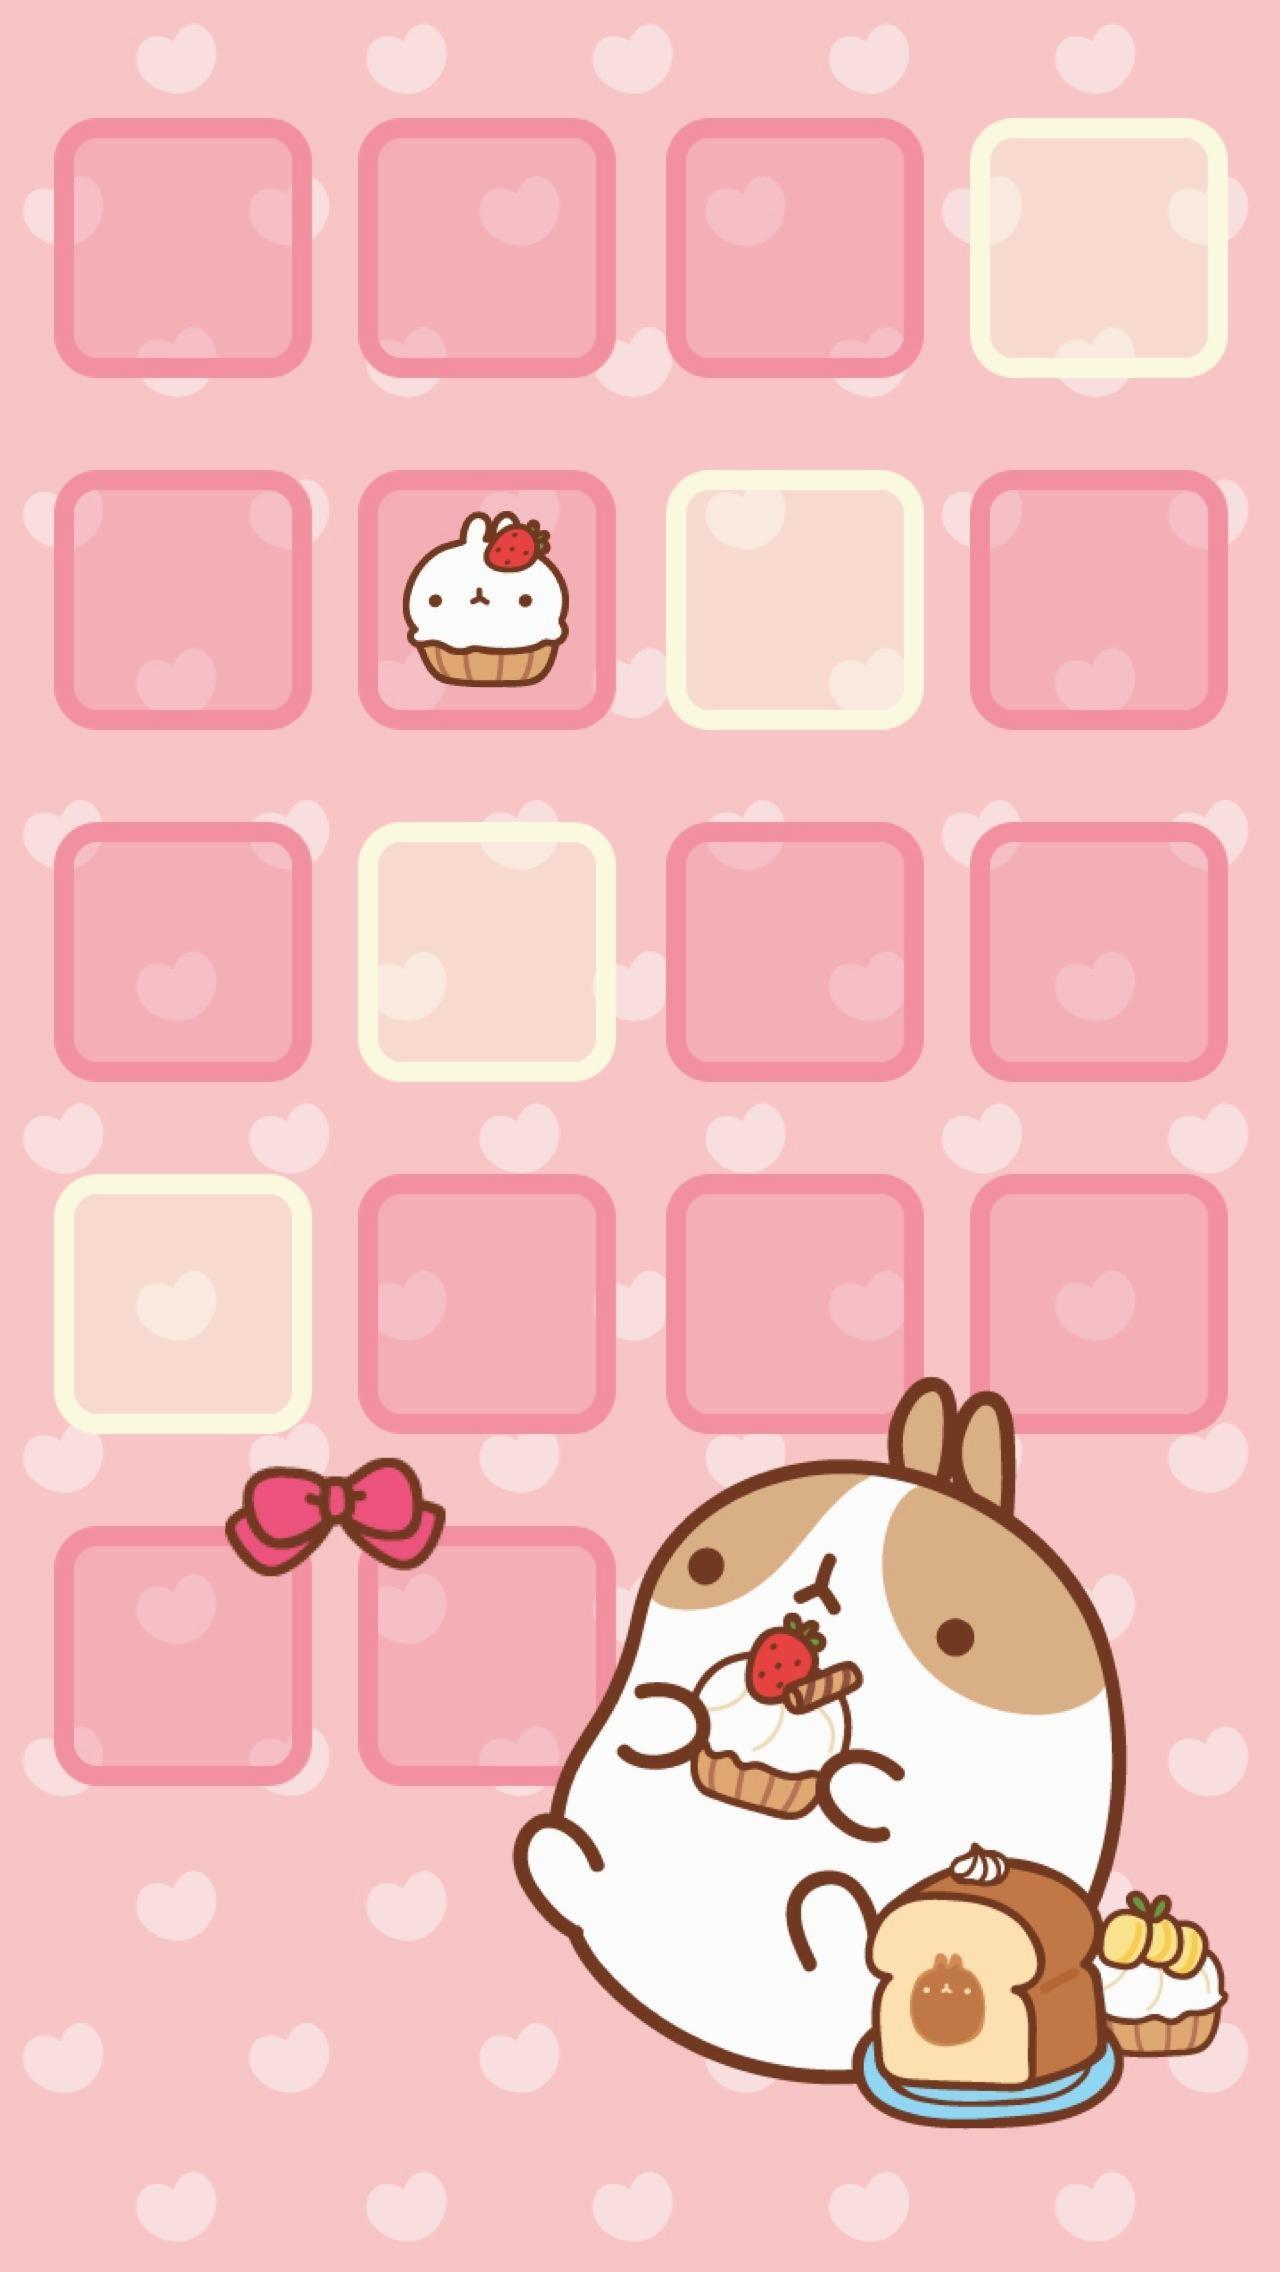 wallpaper.wiki-Kawaii-iPhone-Images-PIC-WPC00467